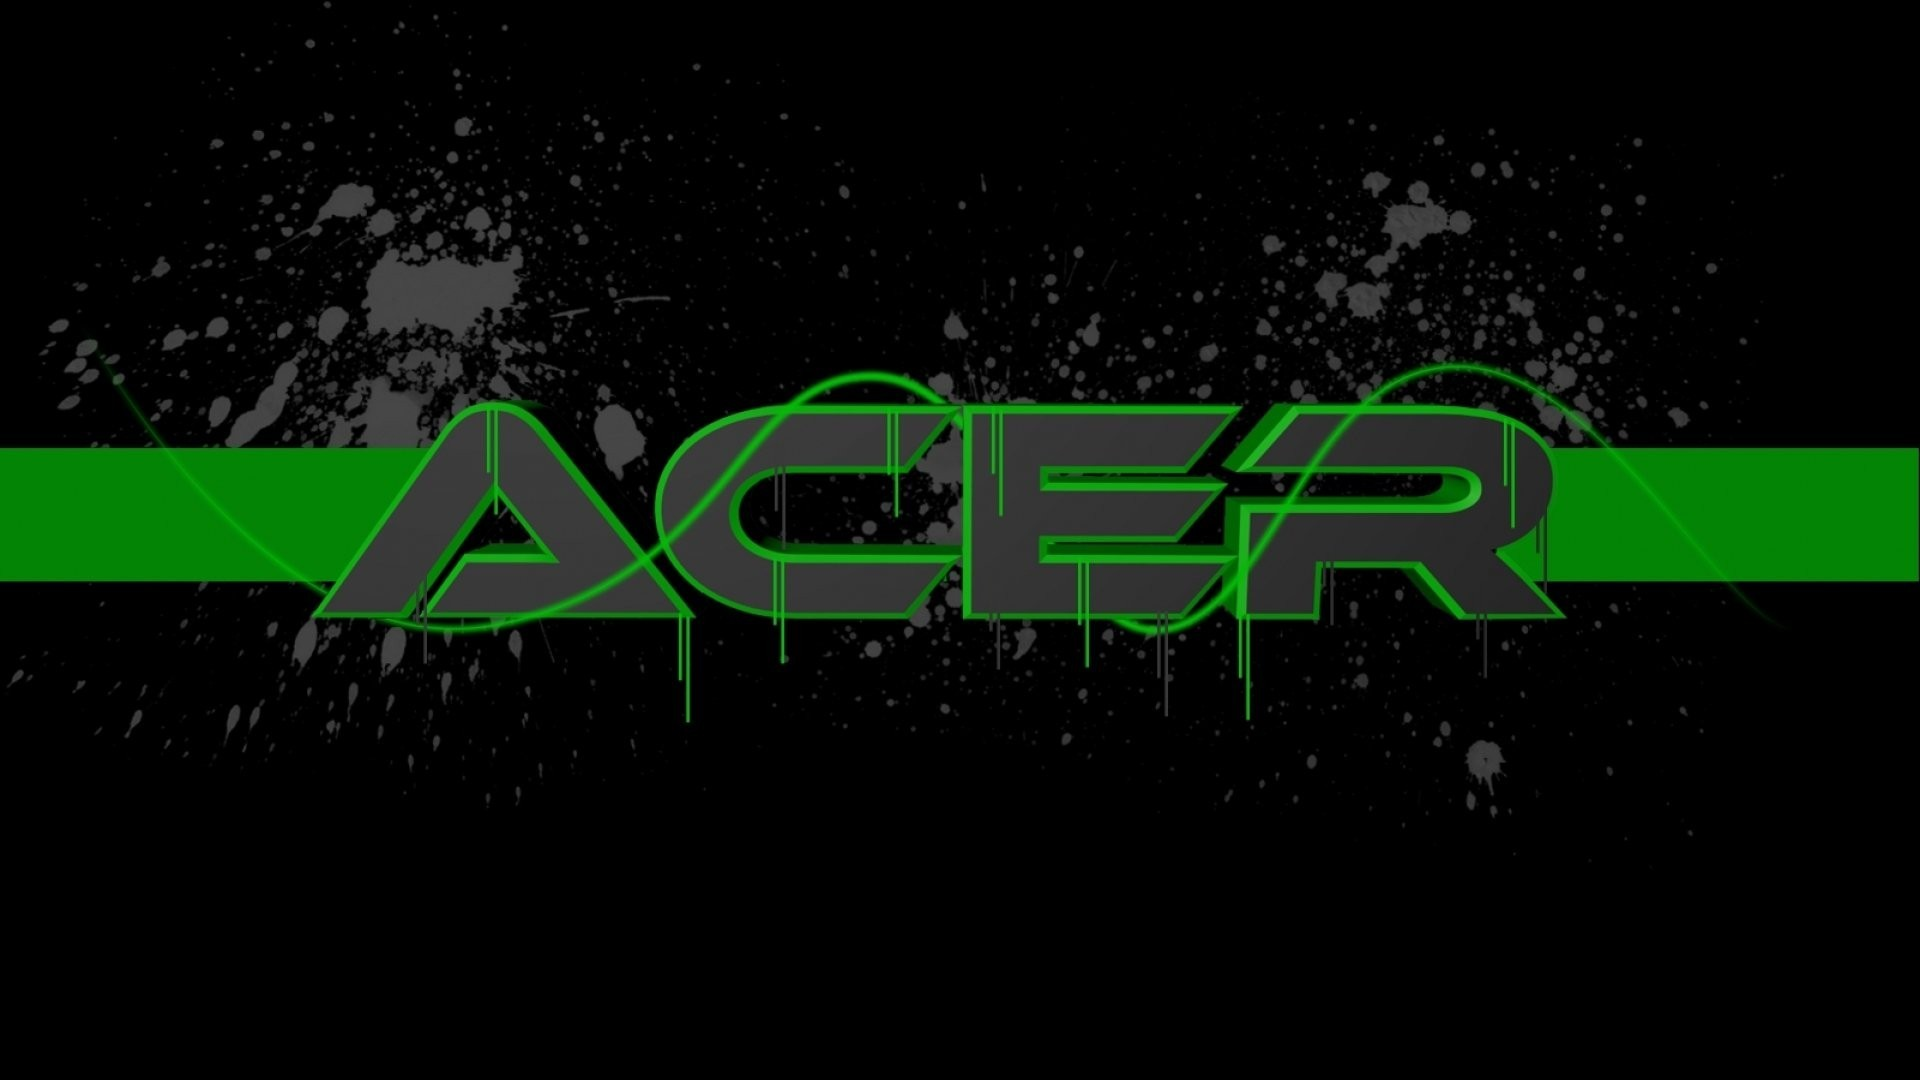 Black Acer wallpaper (1080p) – Wallpaper – Wallpaper Style .